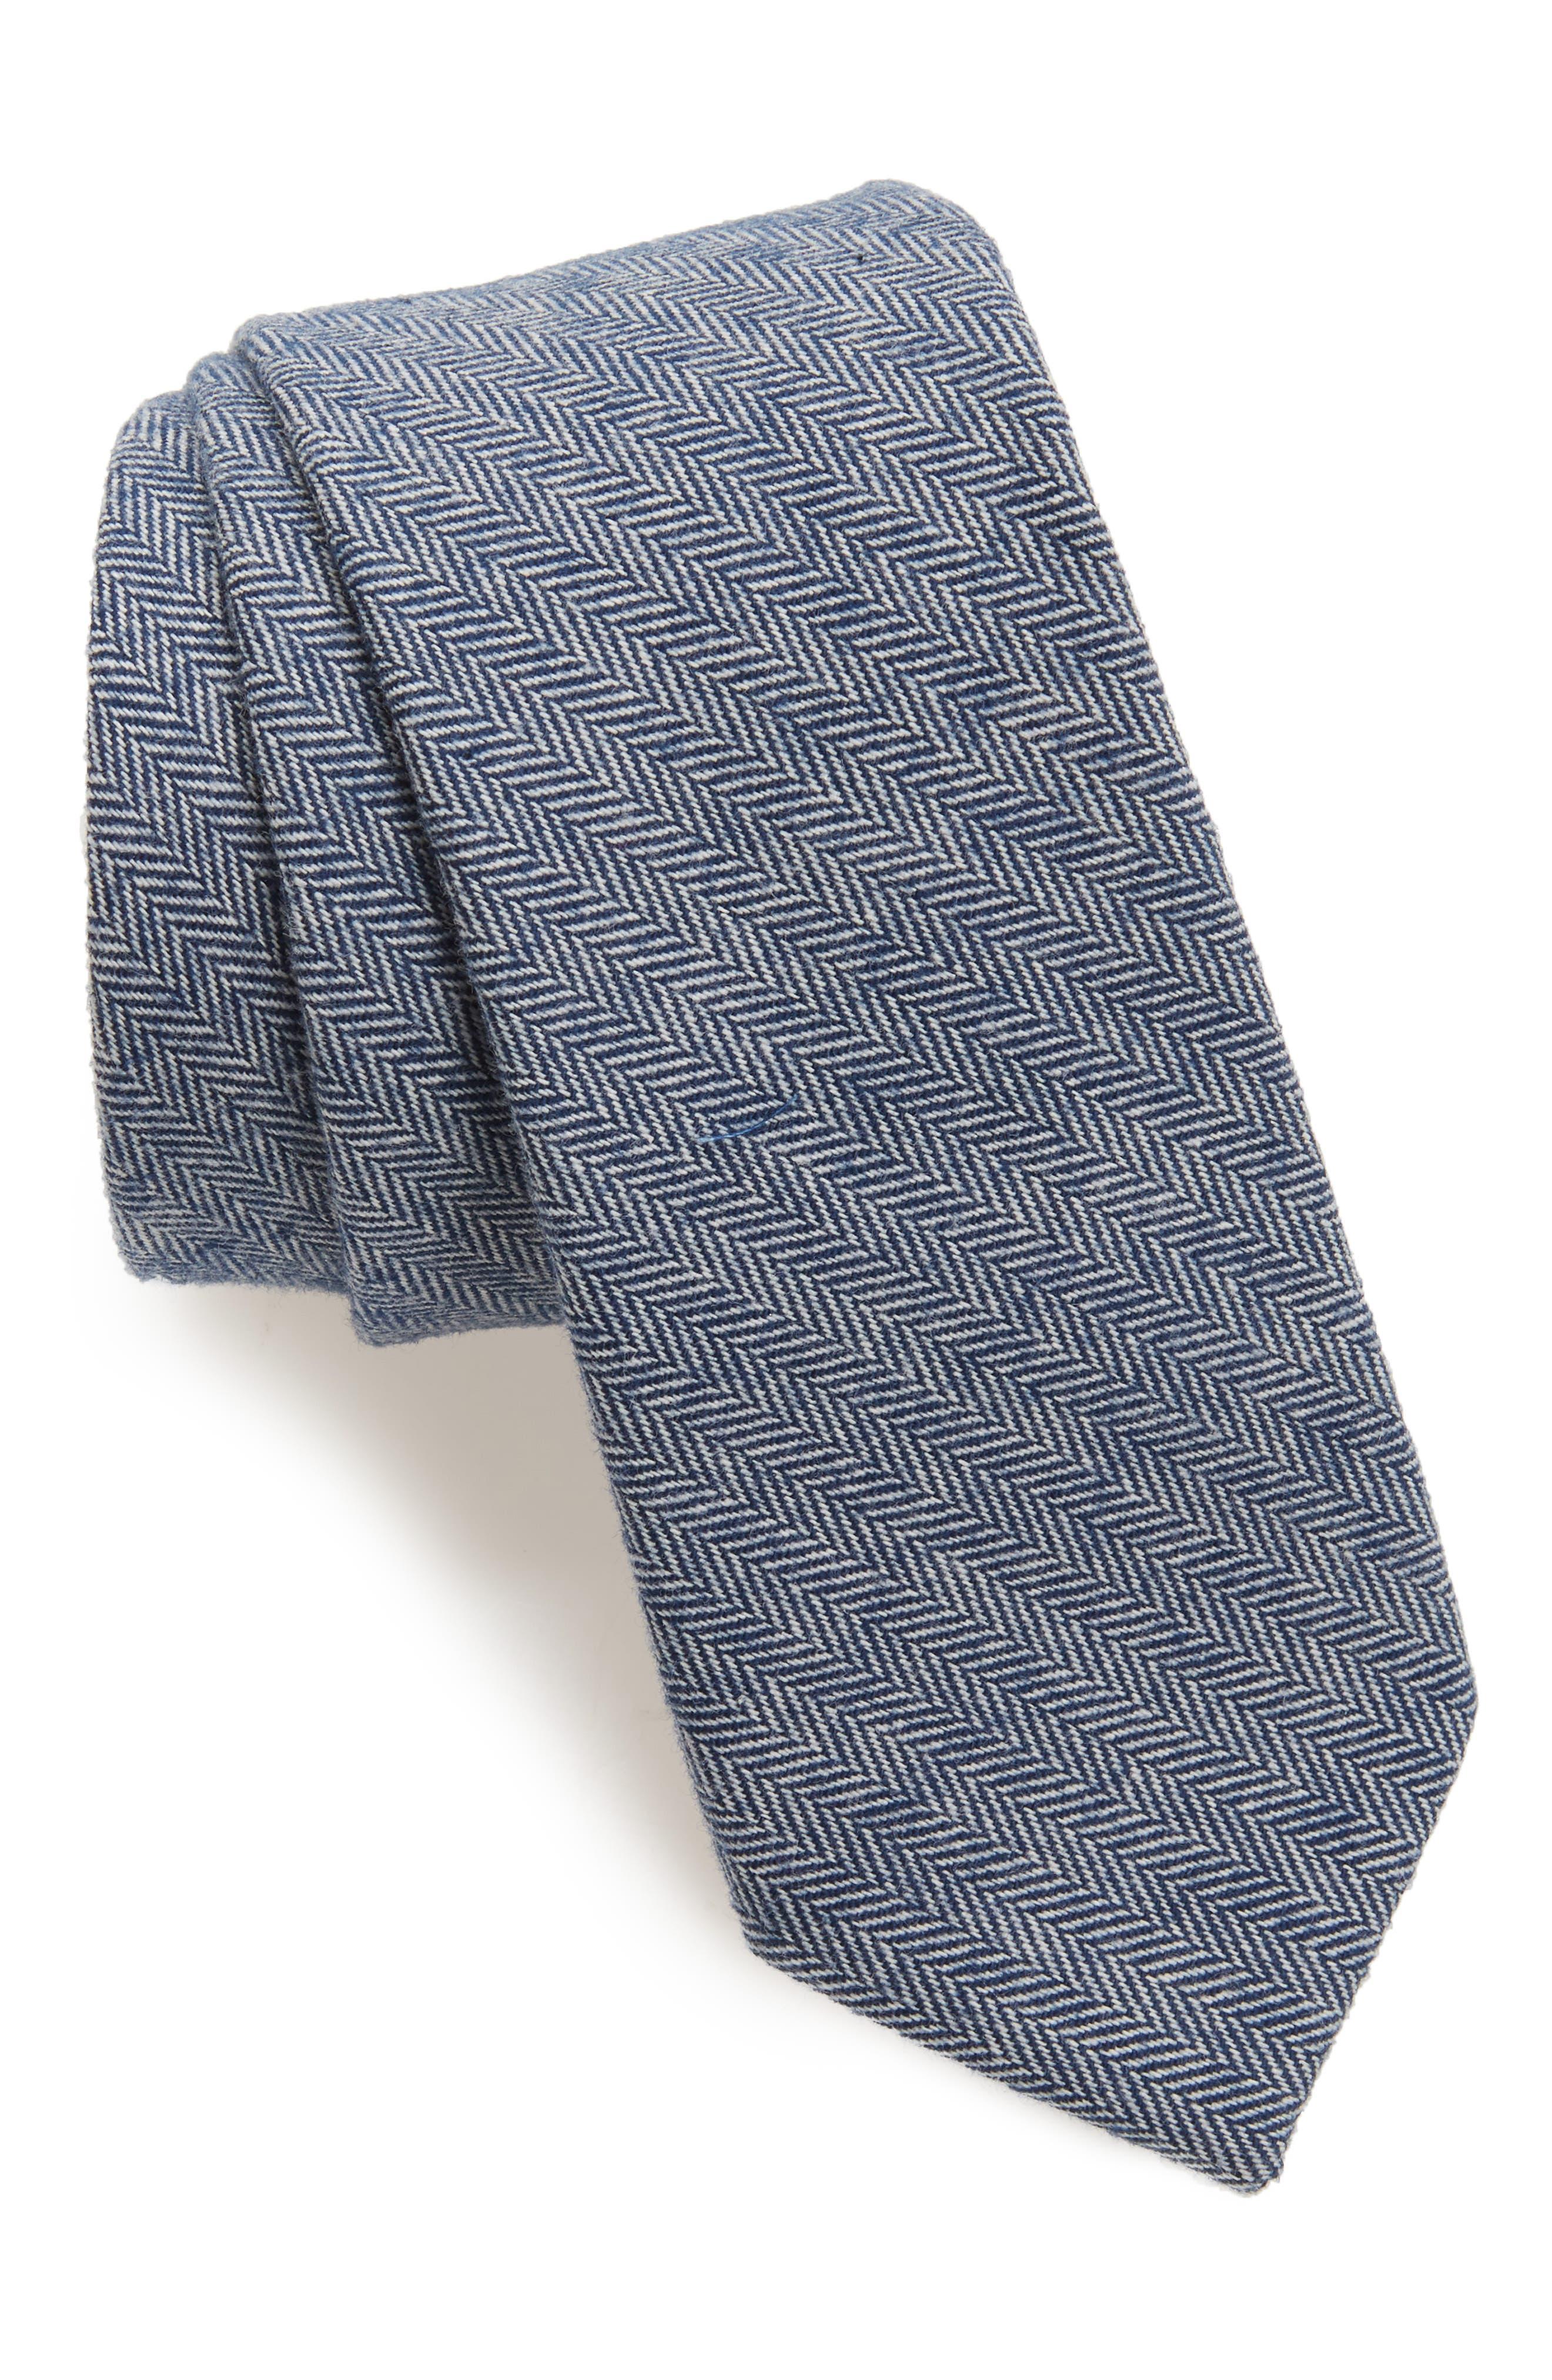 Herringbone Stretch Cotton Tie,                         Main,                         color, 410